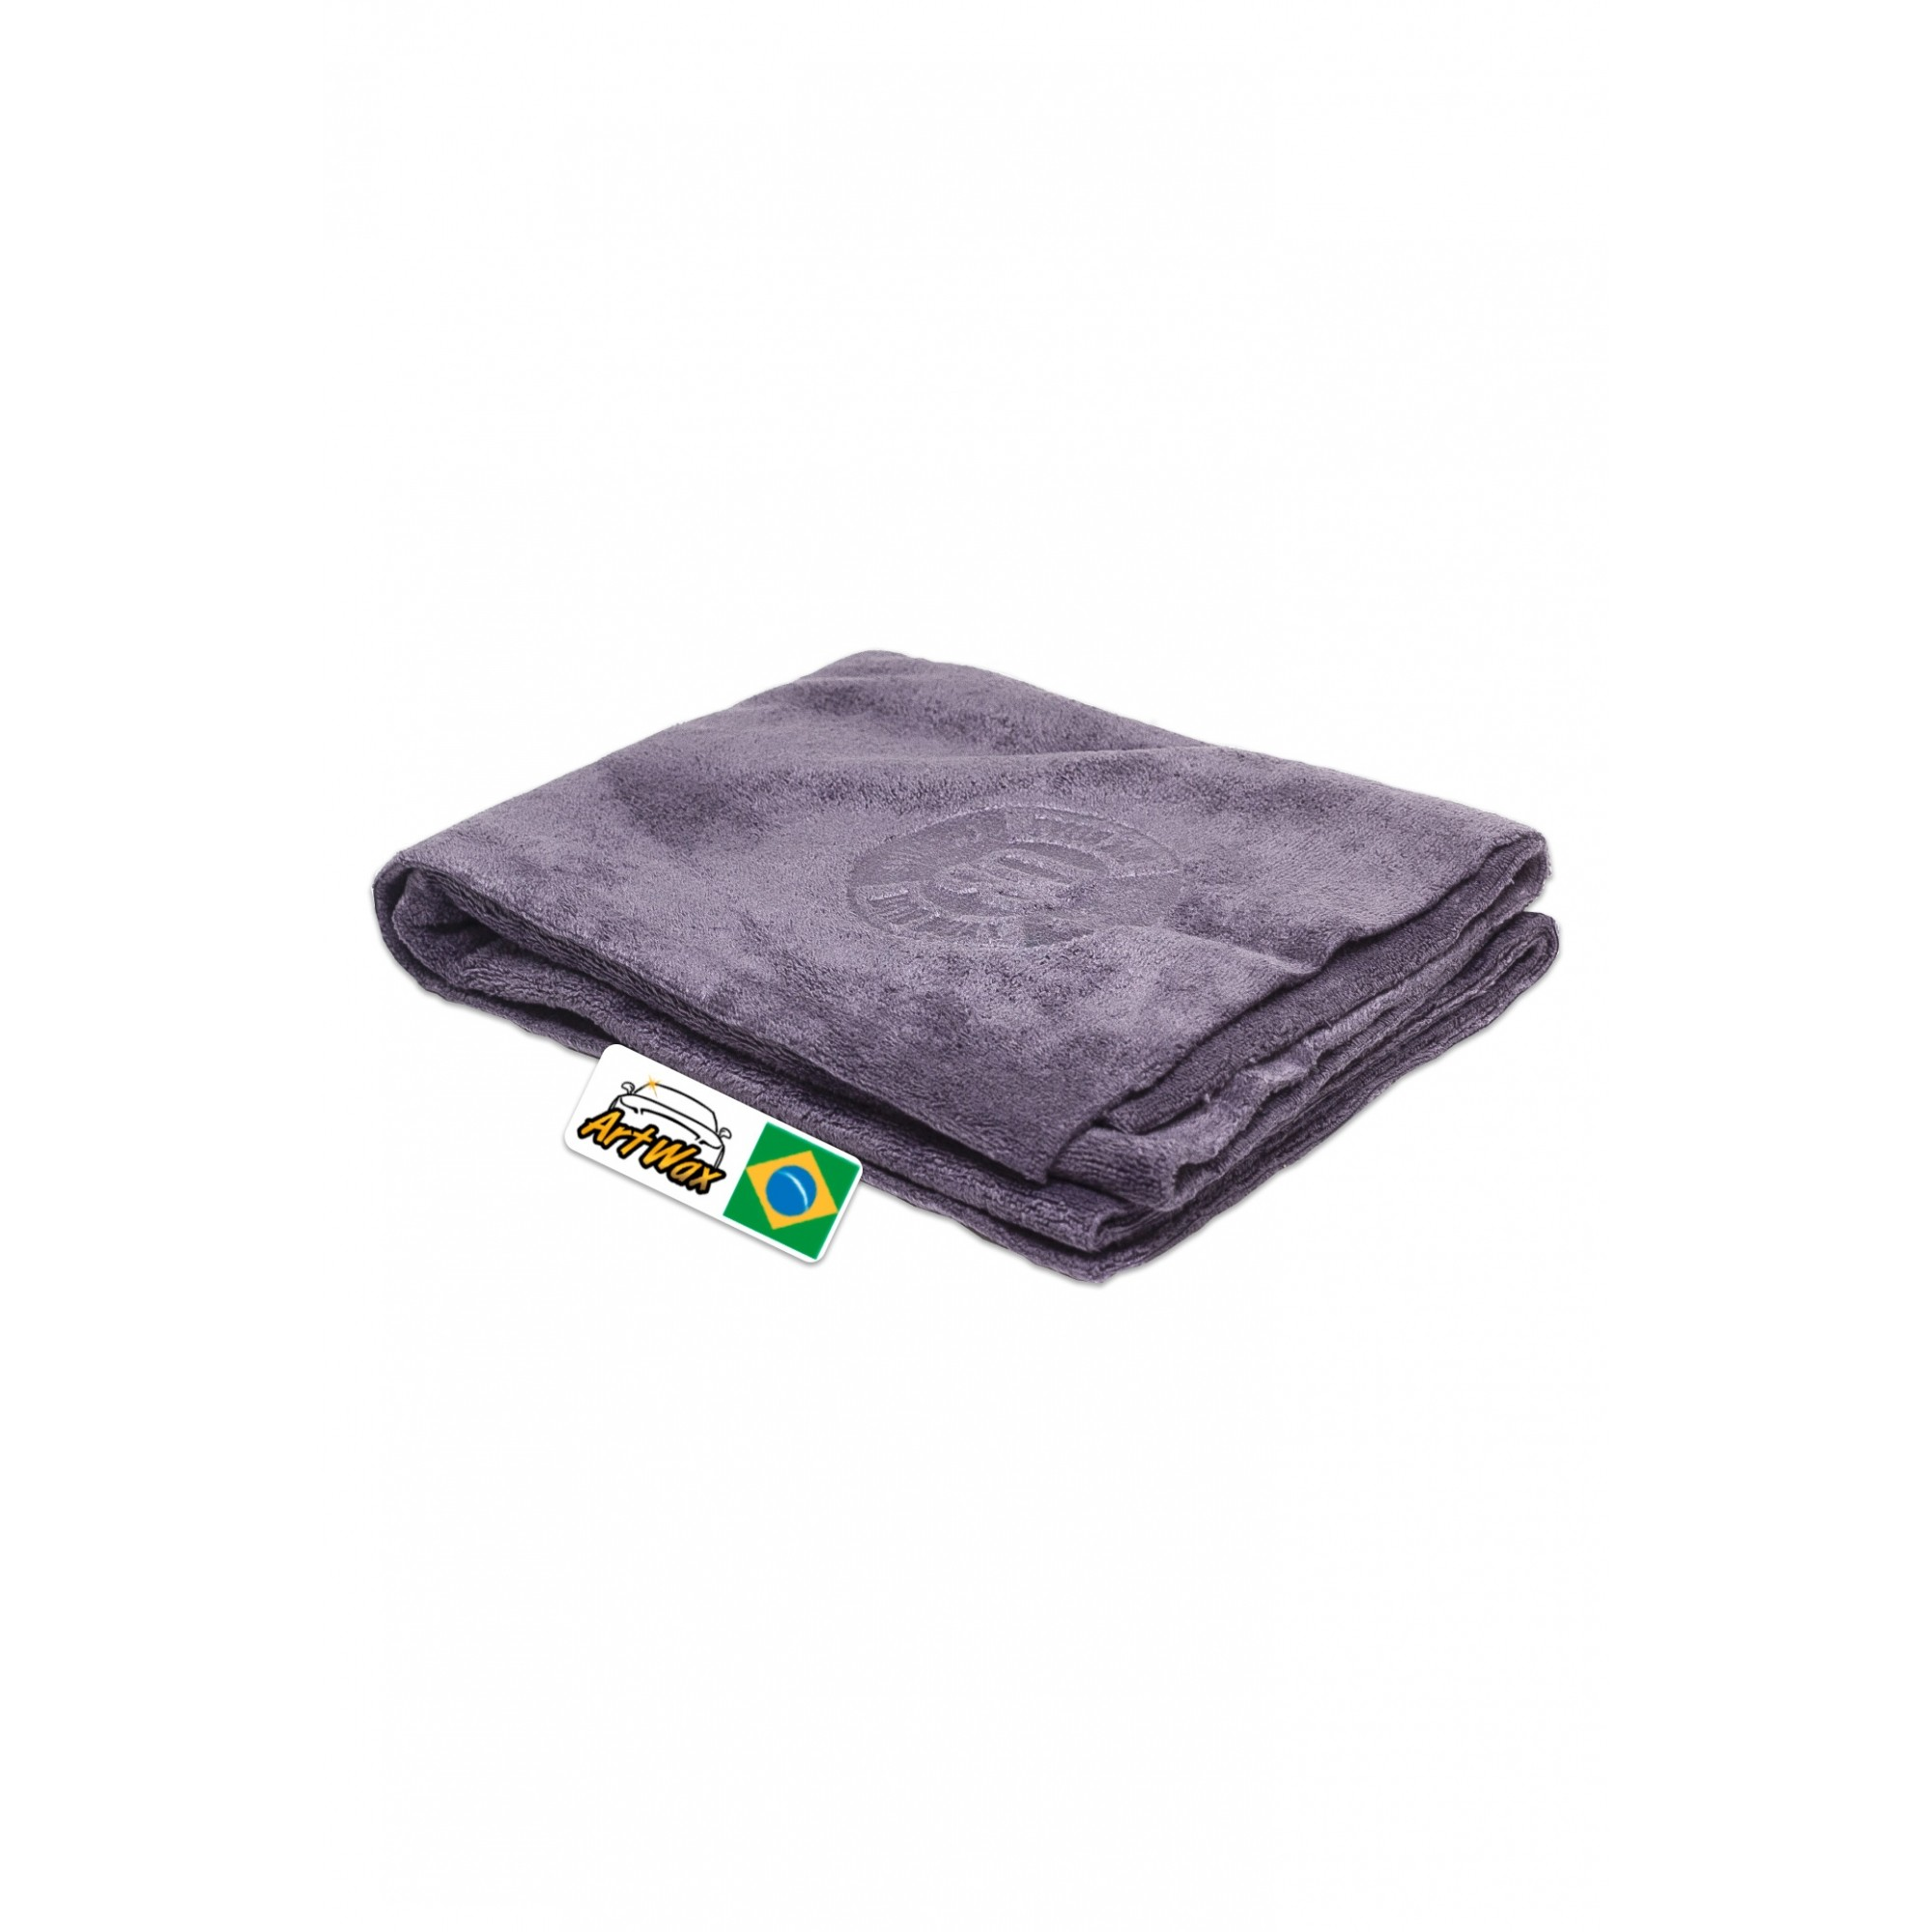 Toalha de Microfibra Cinza DB Towel 60x40cm - 400gsm Dub Boyz